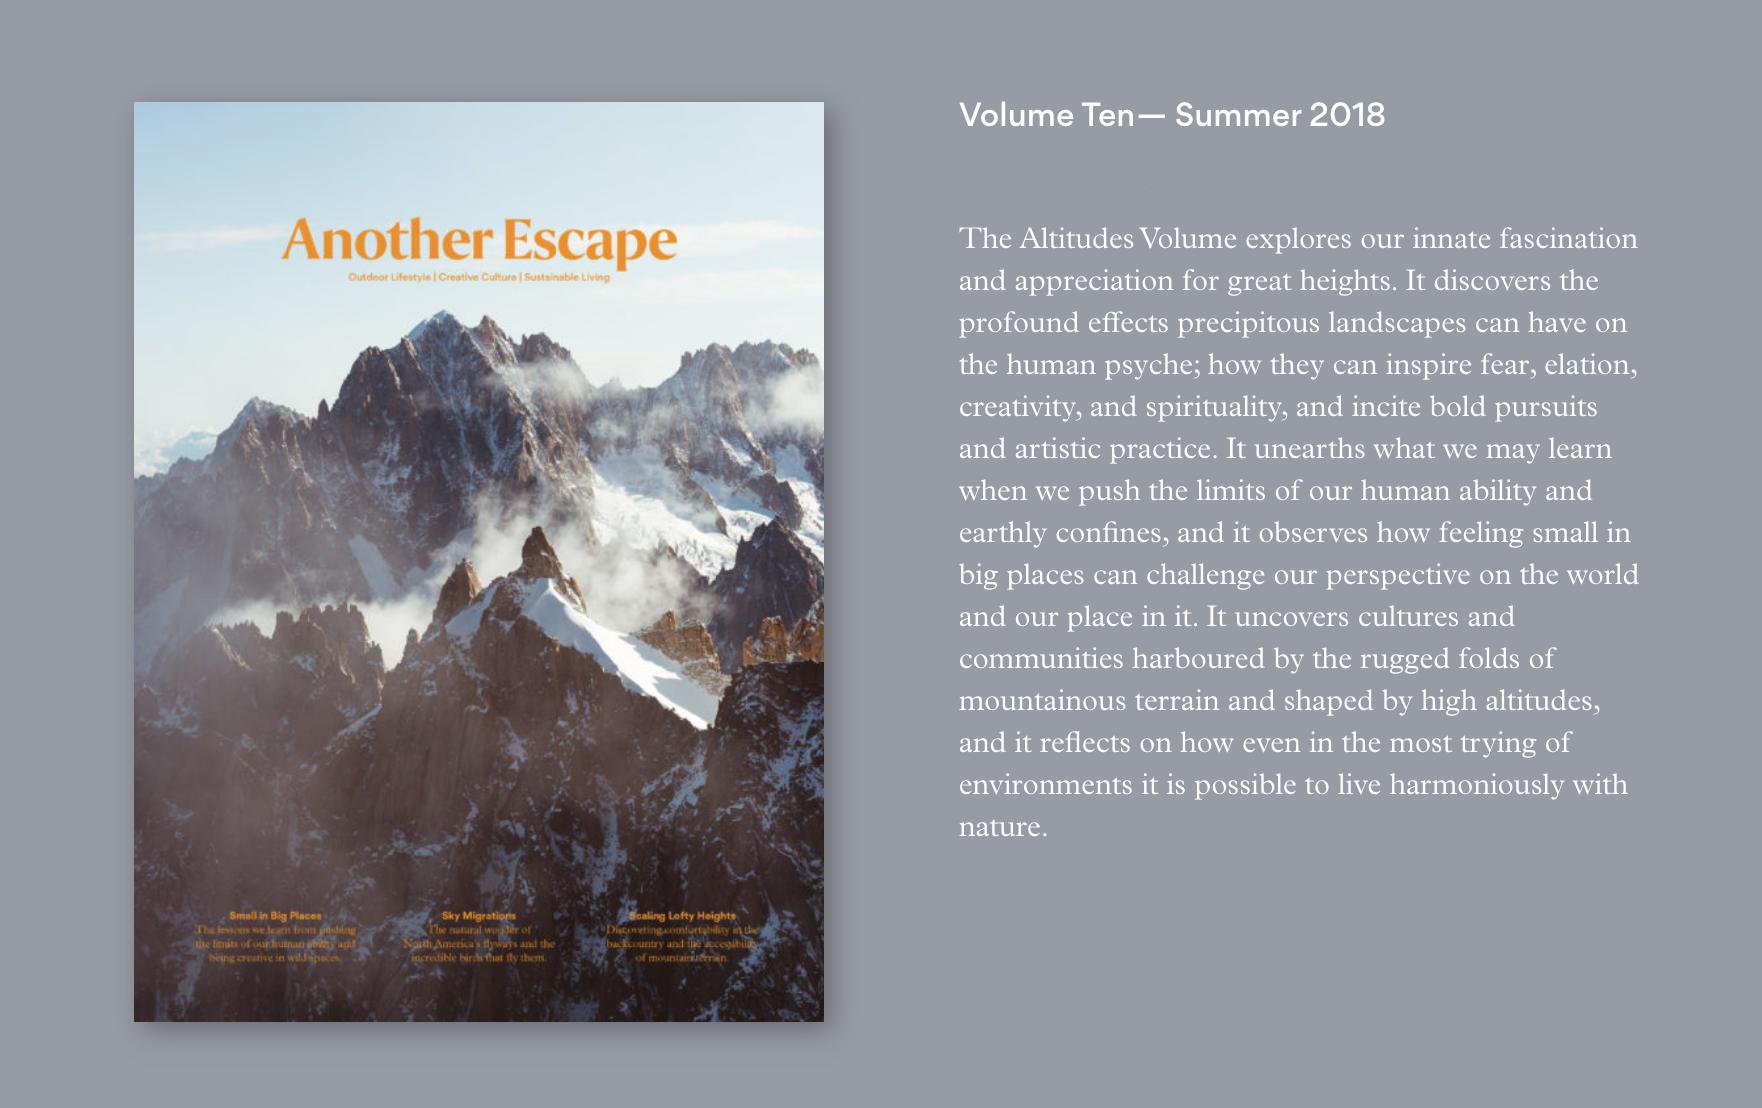 AnotherEscapeMagazine.jpg